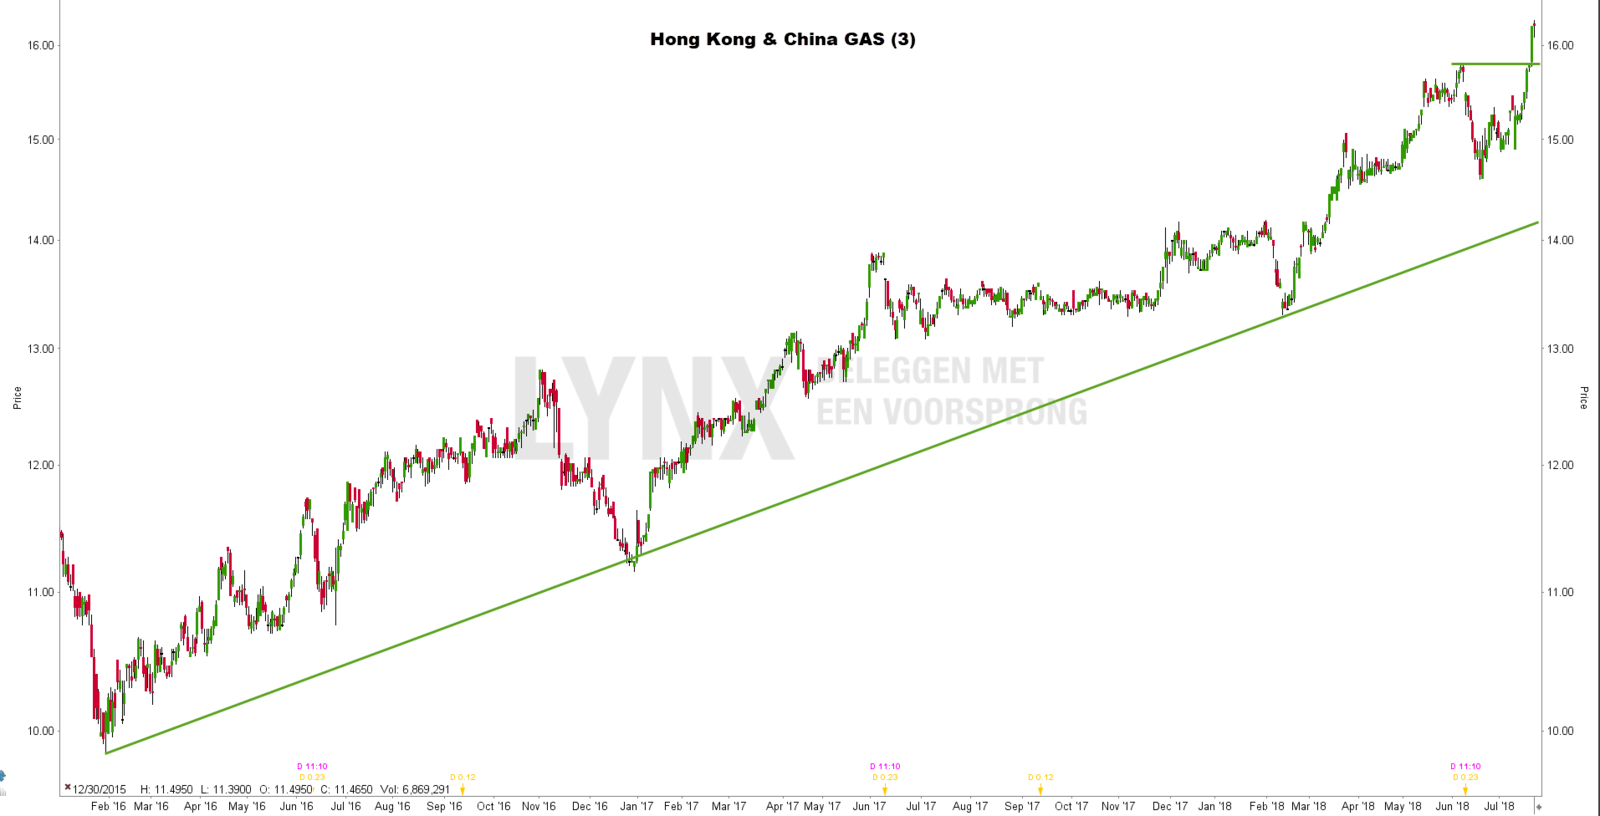 Beste Chinese aandelen: Hong Kong & China GAS